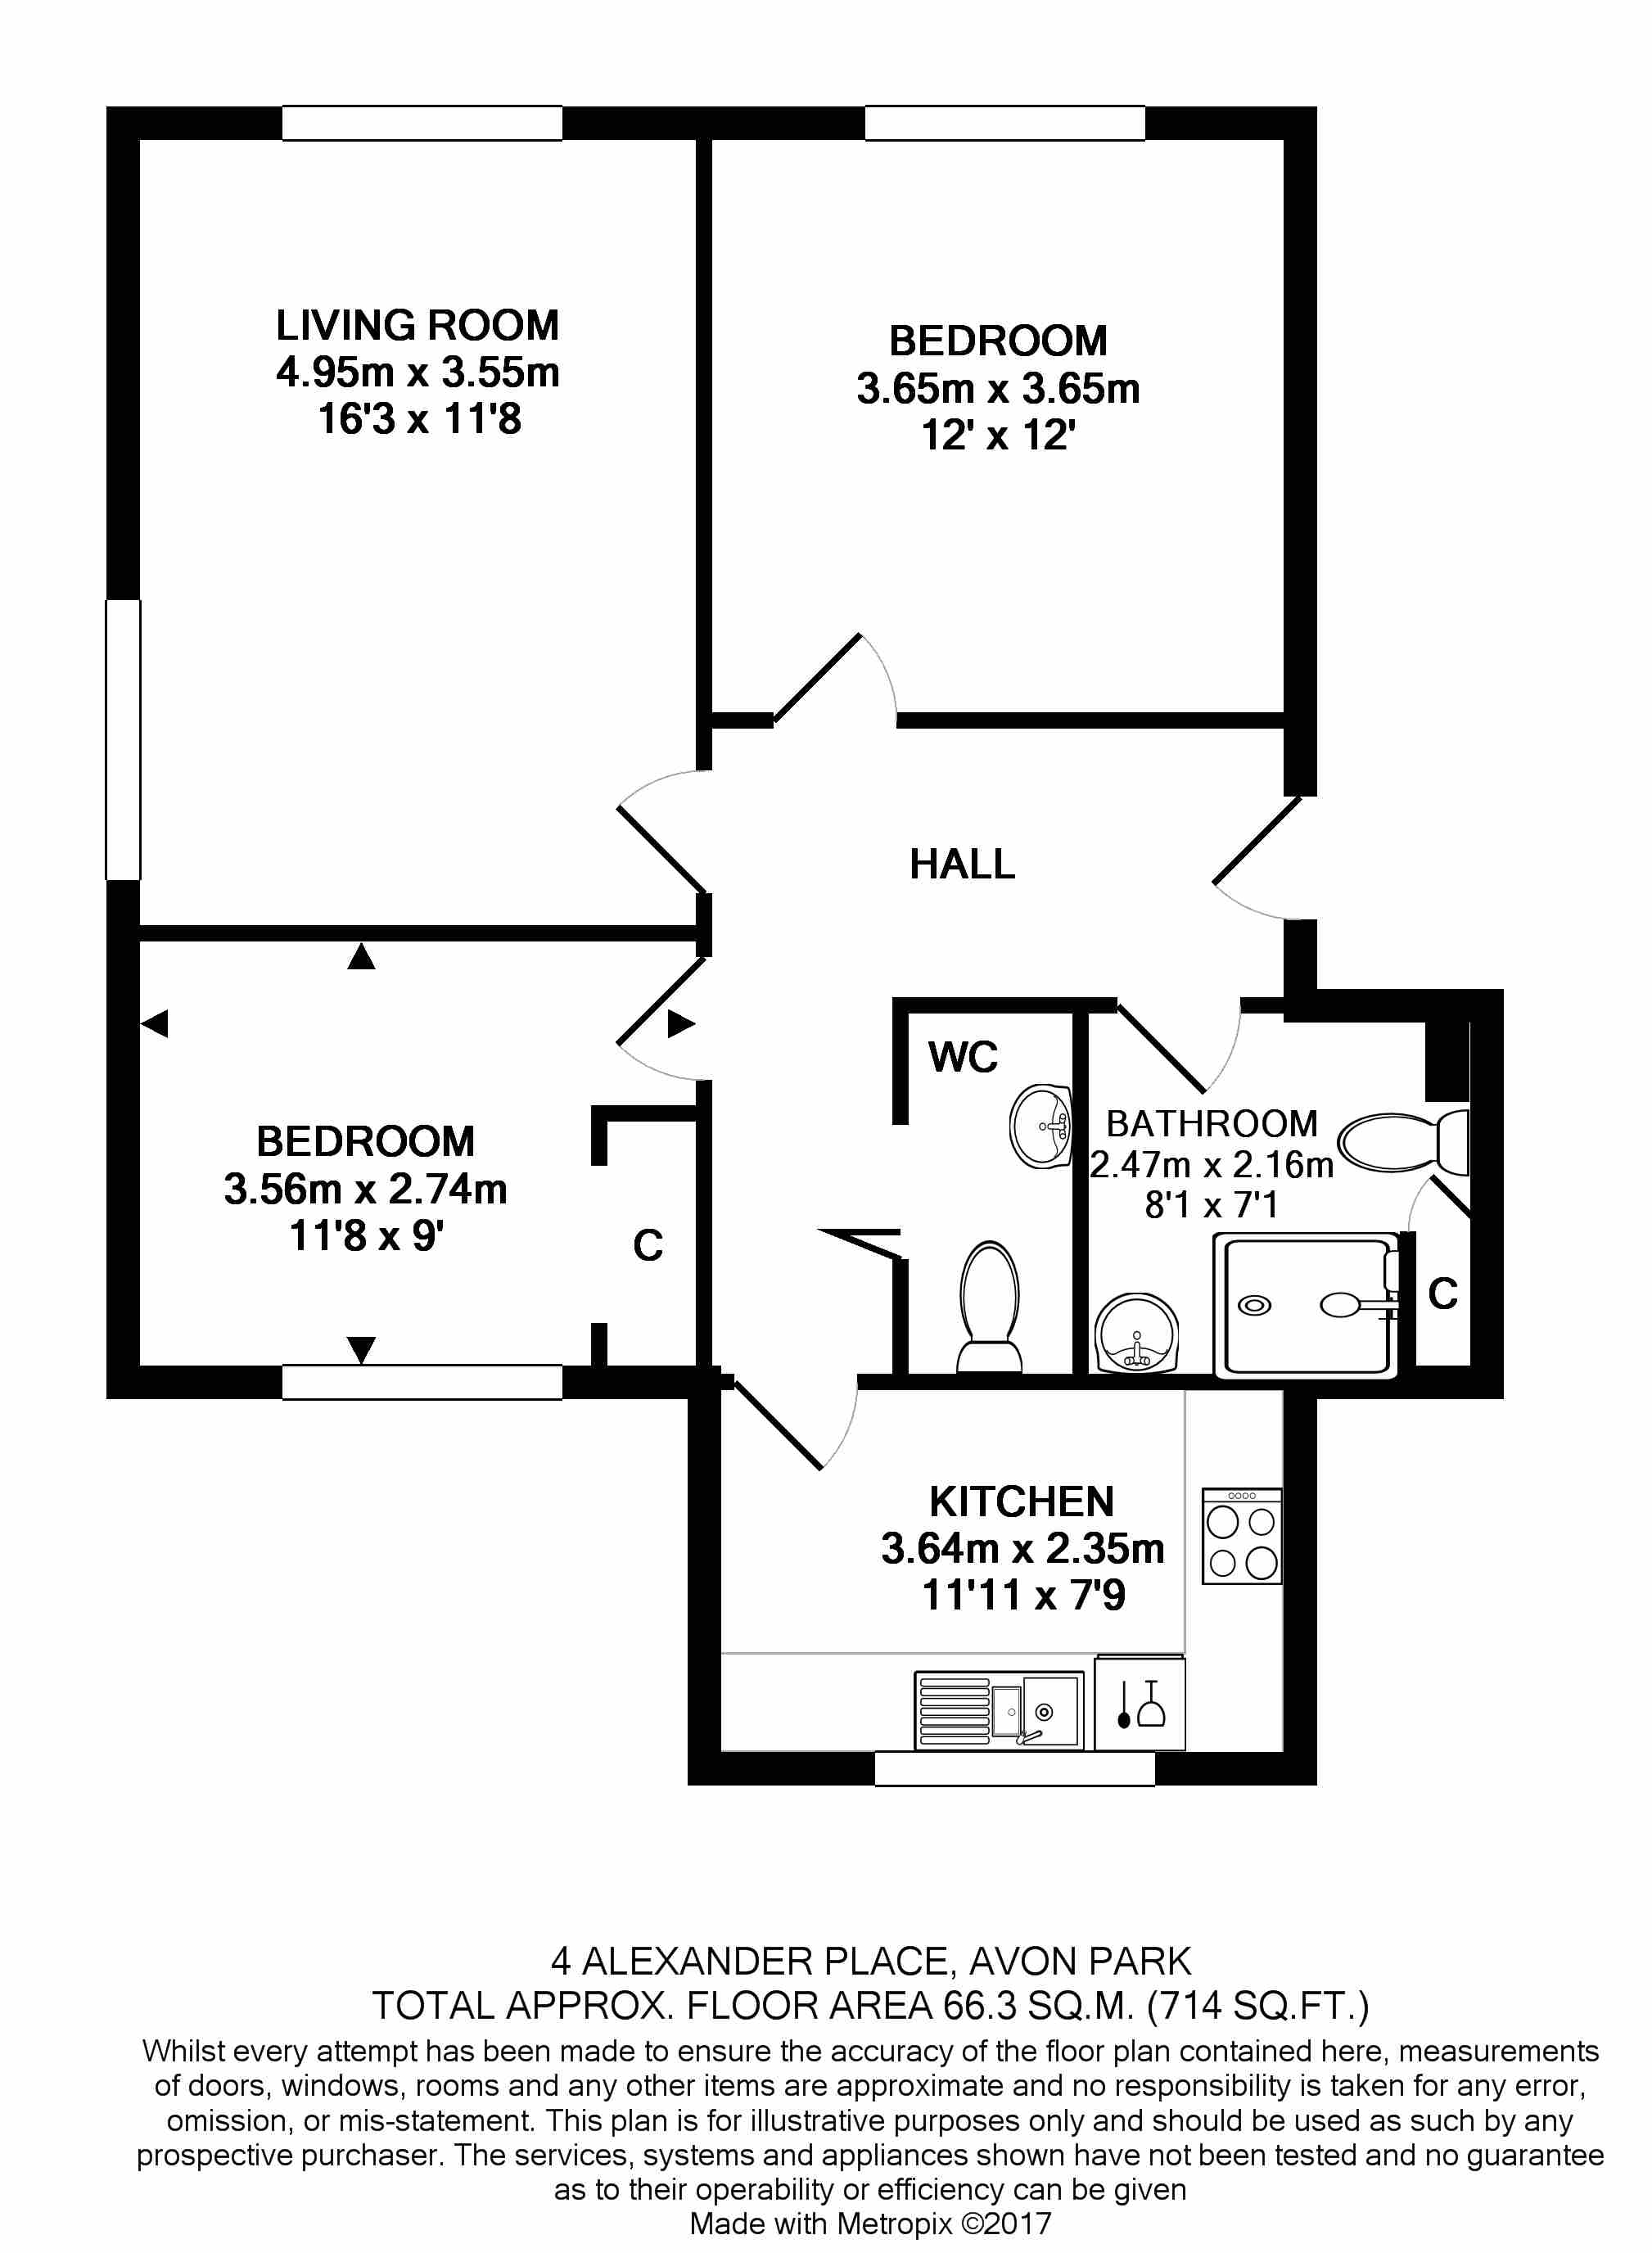 04 Alexander Place Floorplan